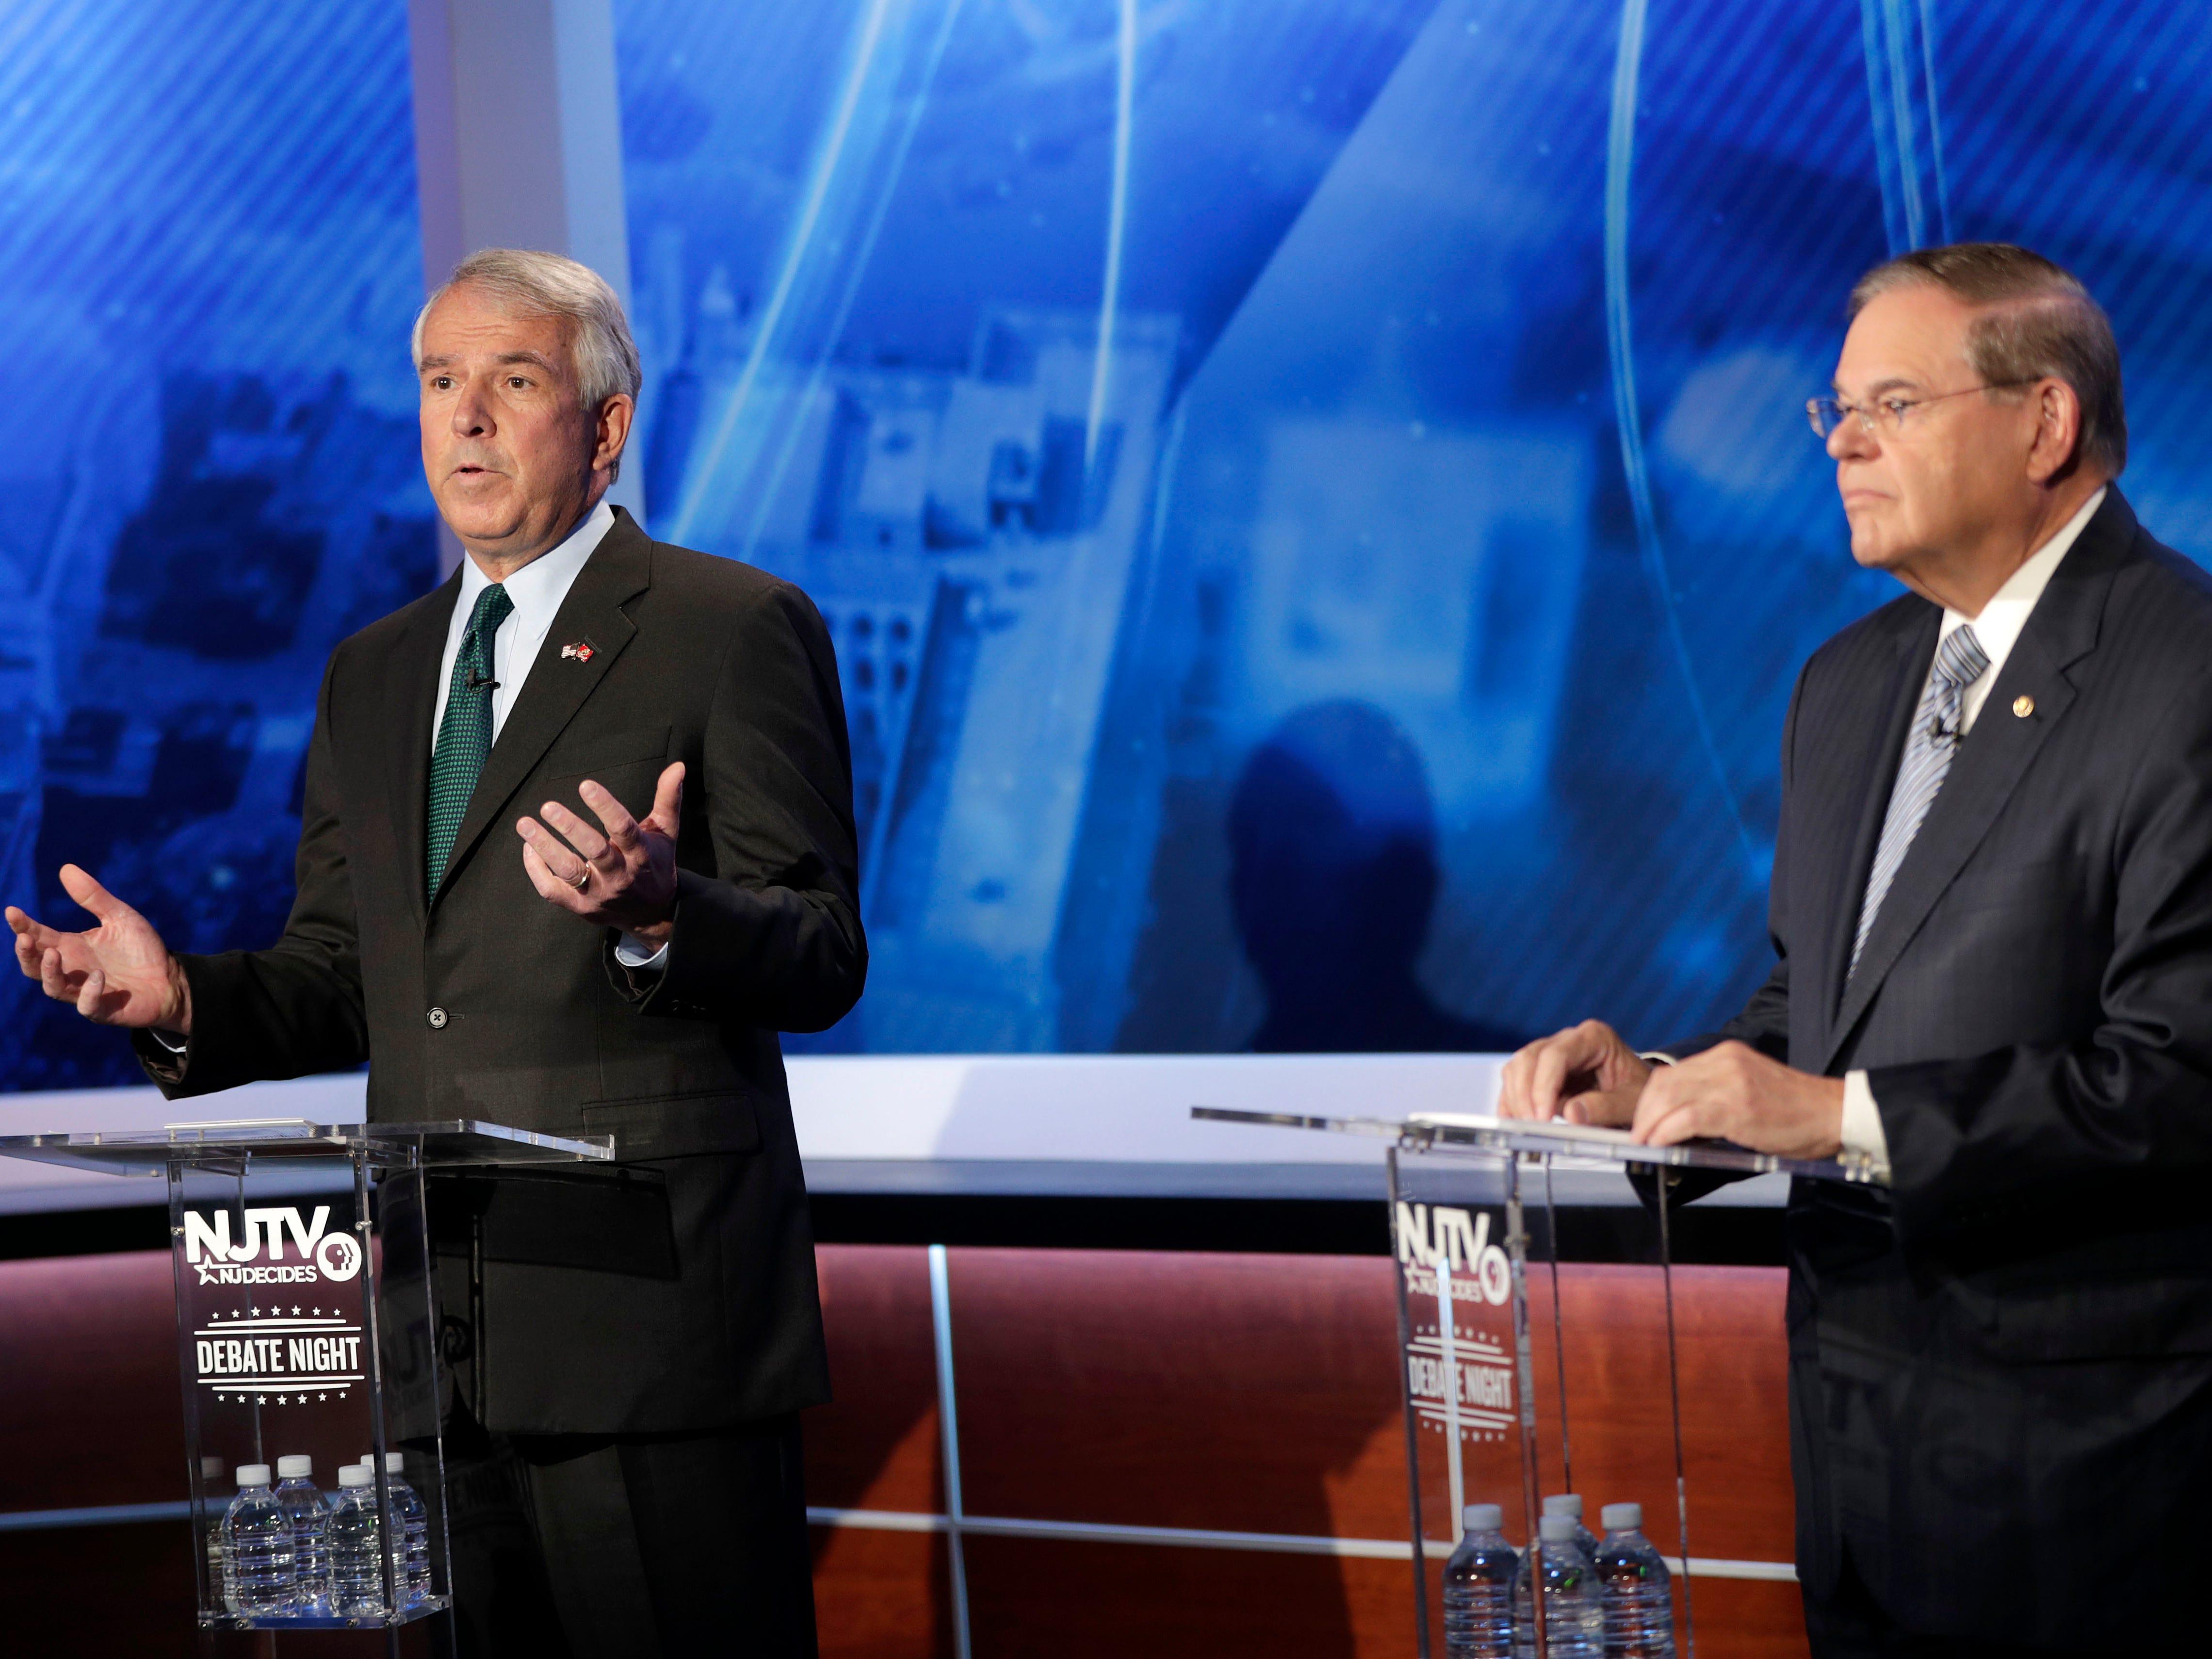 Bob Hugin, left, the Republican candidate for the U.S. Senate race in New Jersey, speaks during debate with Sen. Bob Menendez, the Democrat candidate, Wednesday, Oct. 24, 2018, in Newark, N.J.